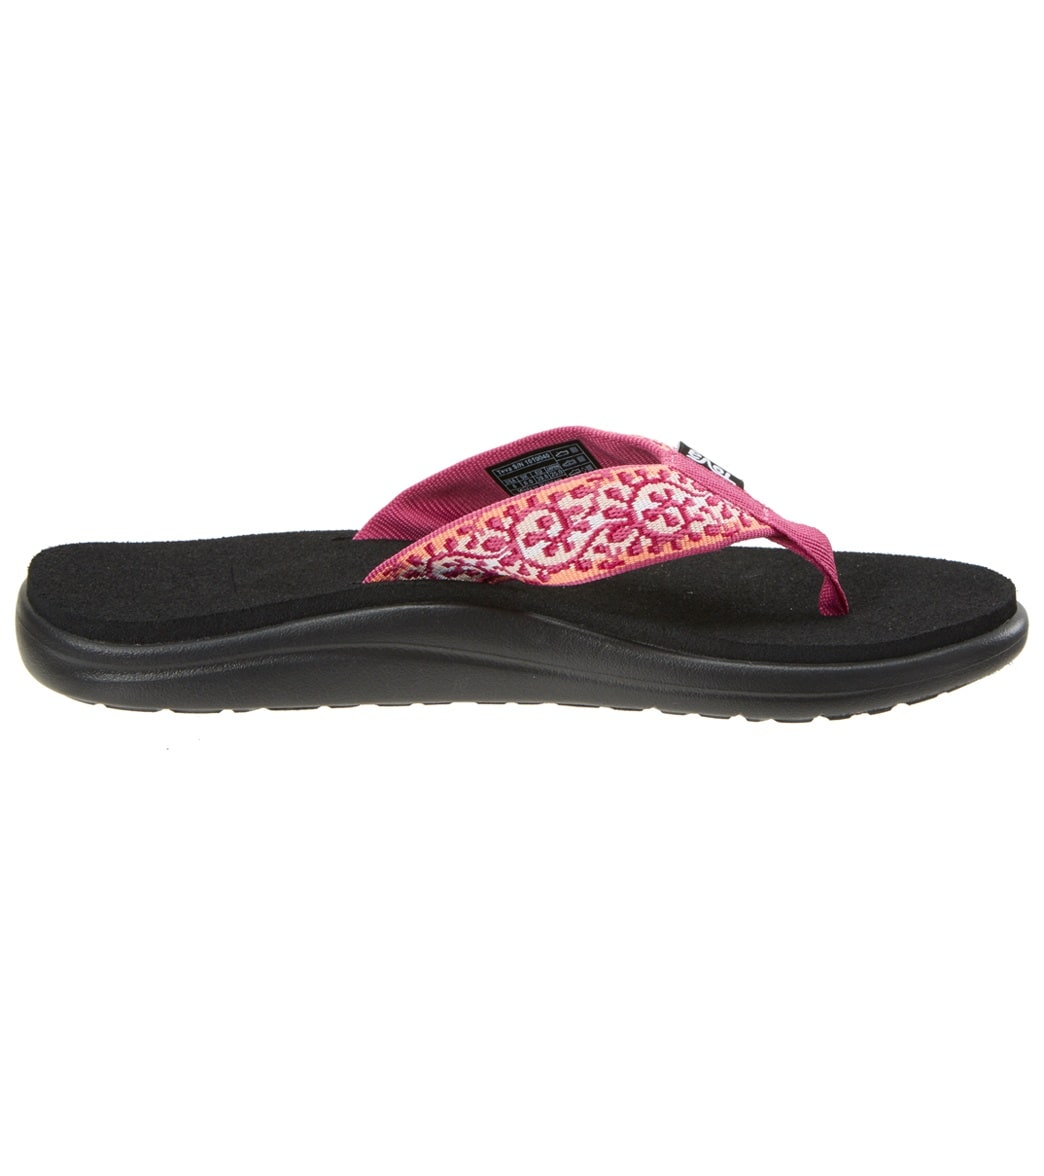 0d885fd86579 Teva Women s Voya Flip Flop at SwimOutlet.com